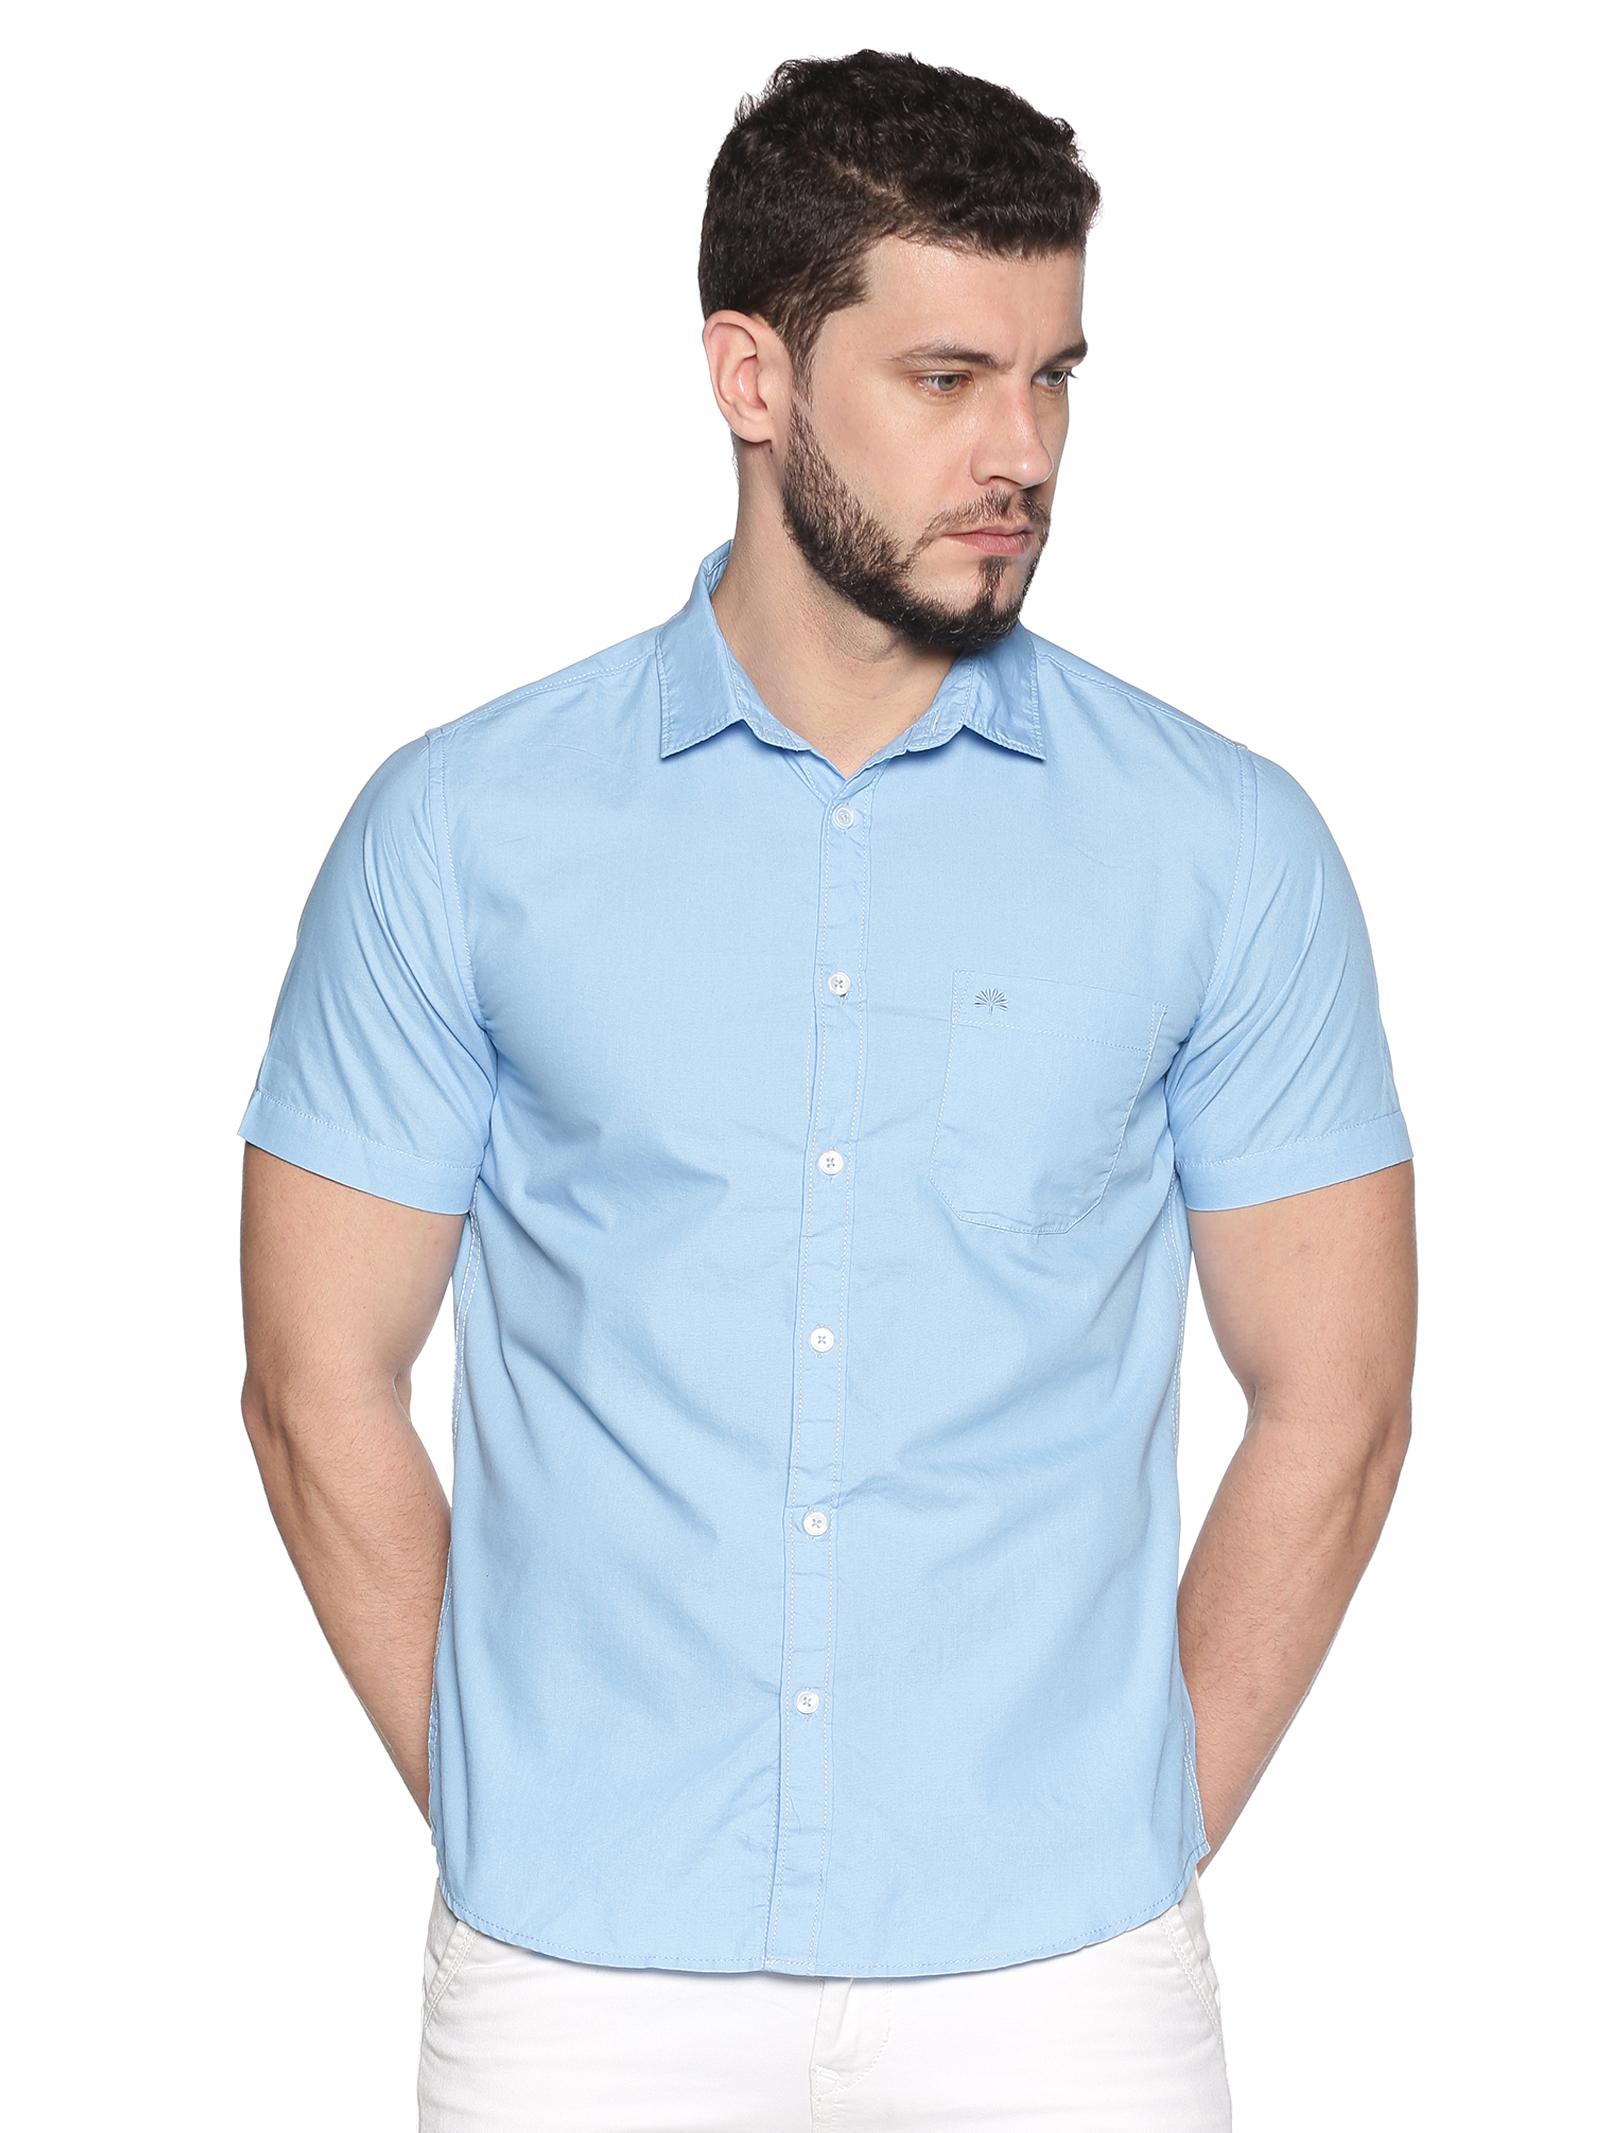 Chennis | Chennis Men's Powder Blue Cotton Casual Shirt